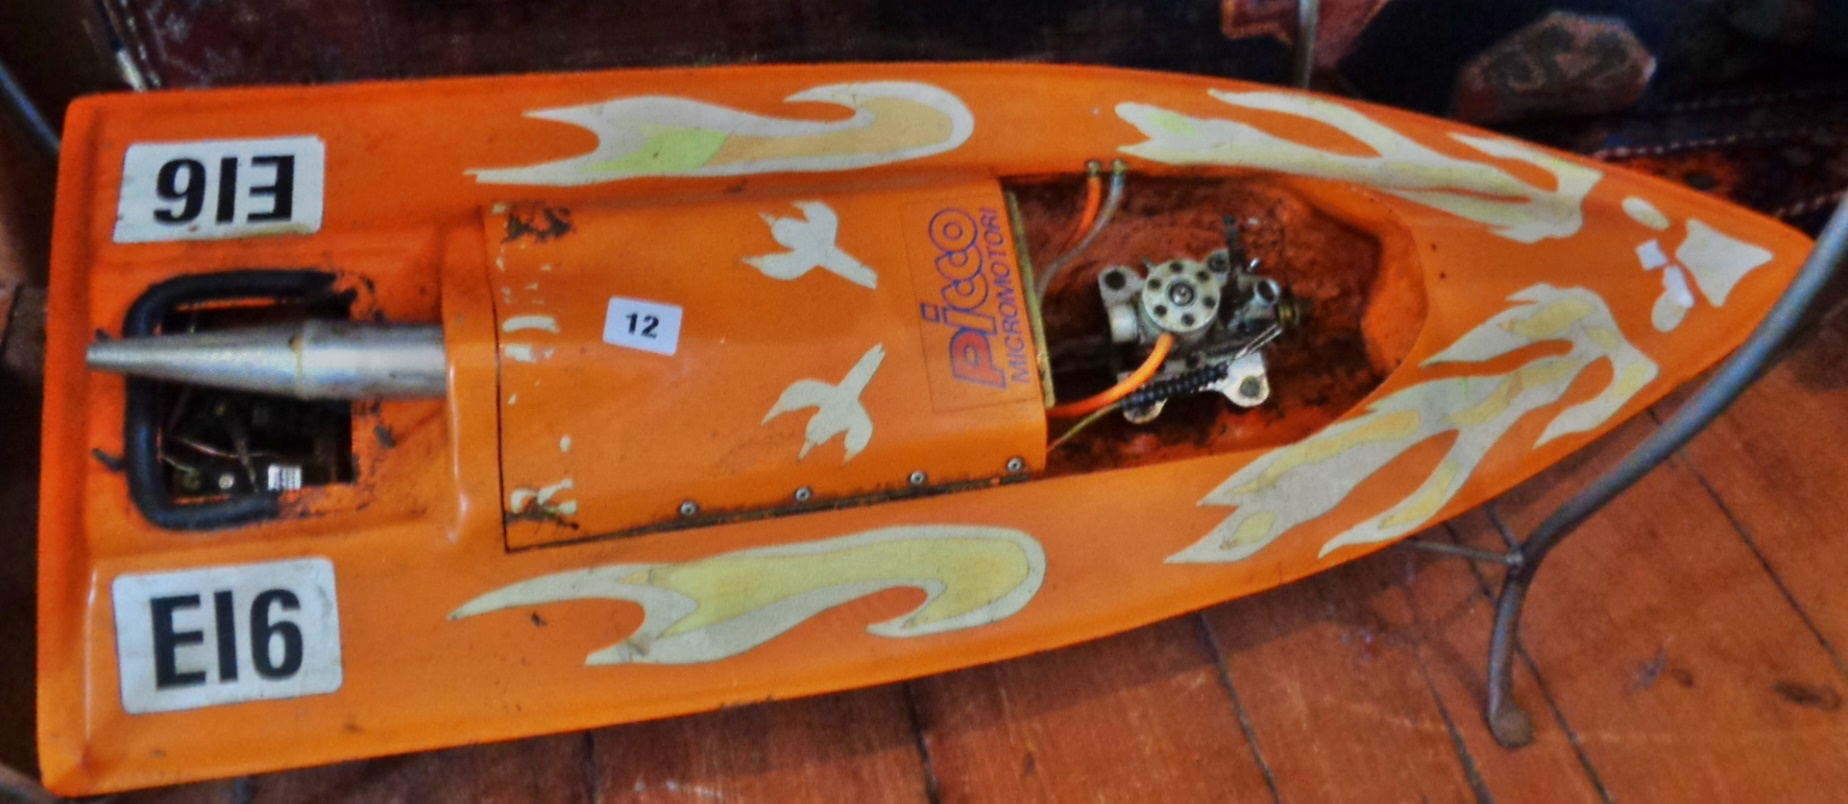 Lot 12 - Picco Micromotori RC speedboat (untested)